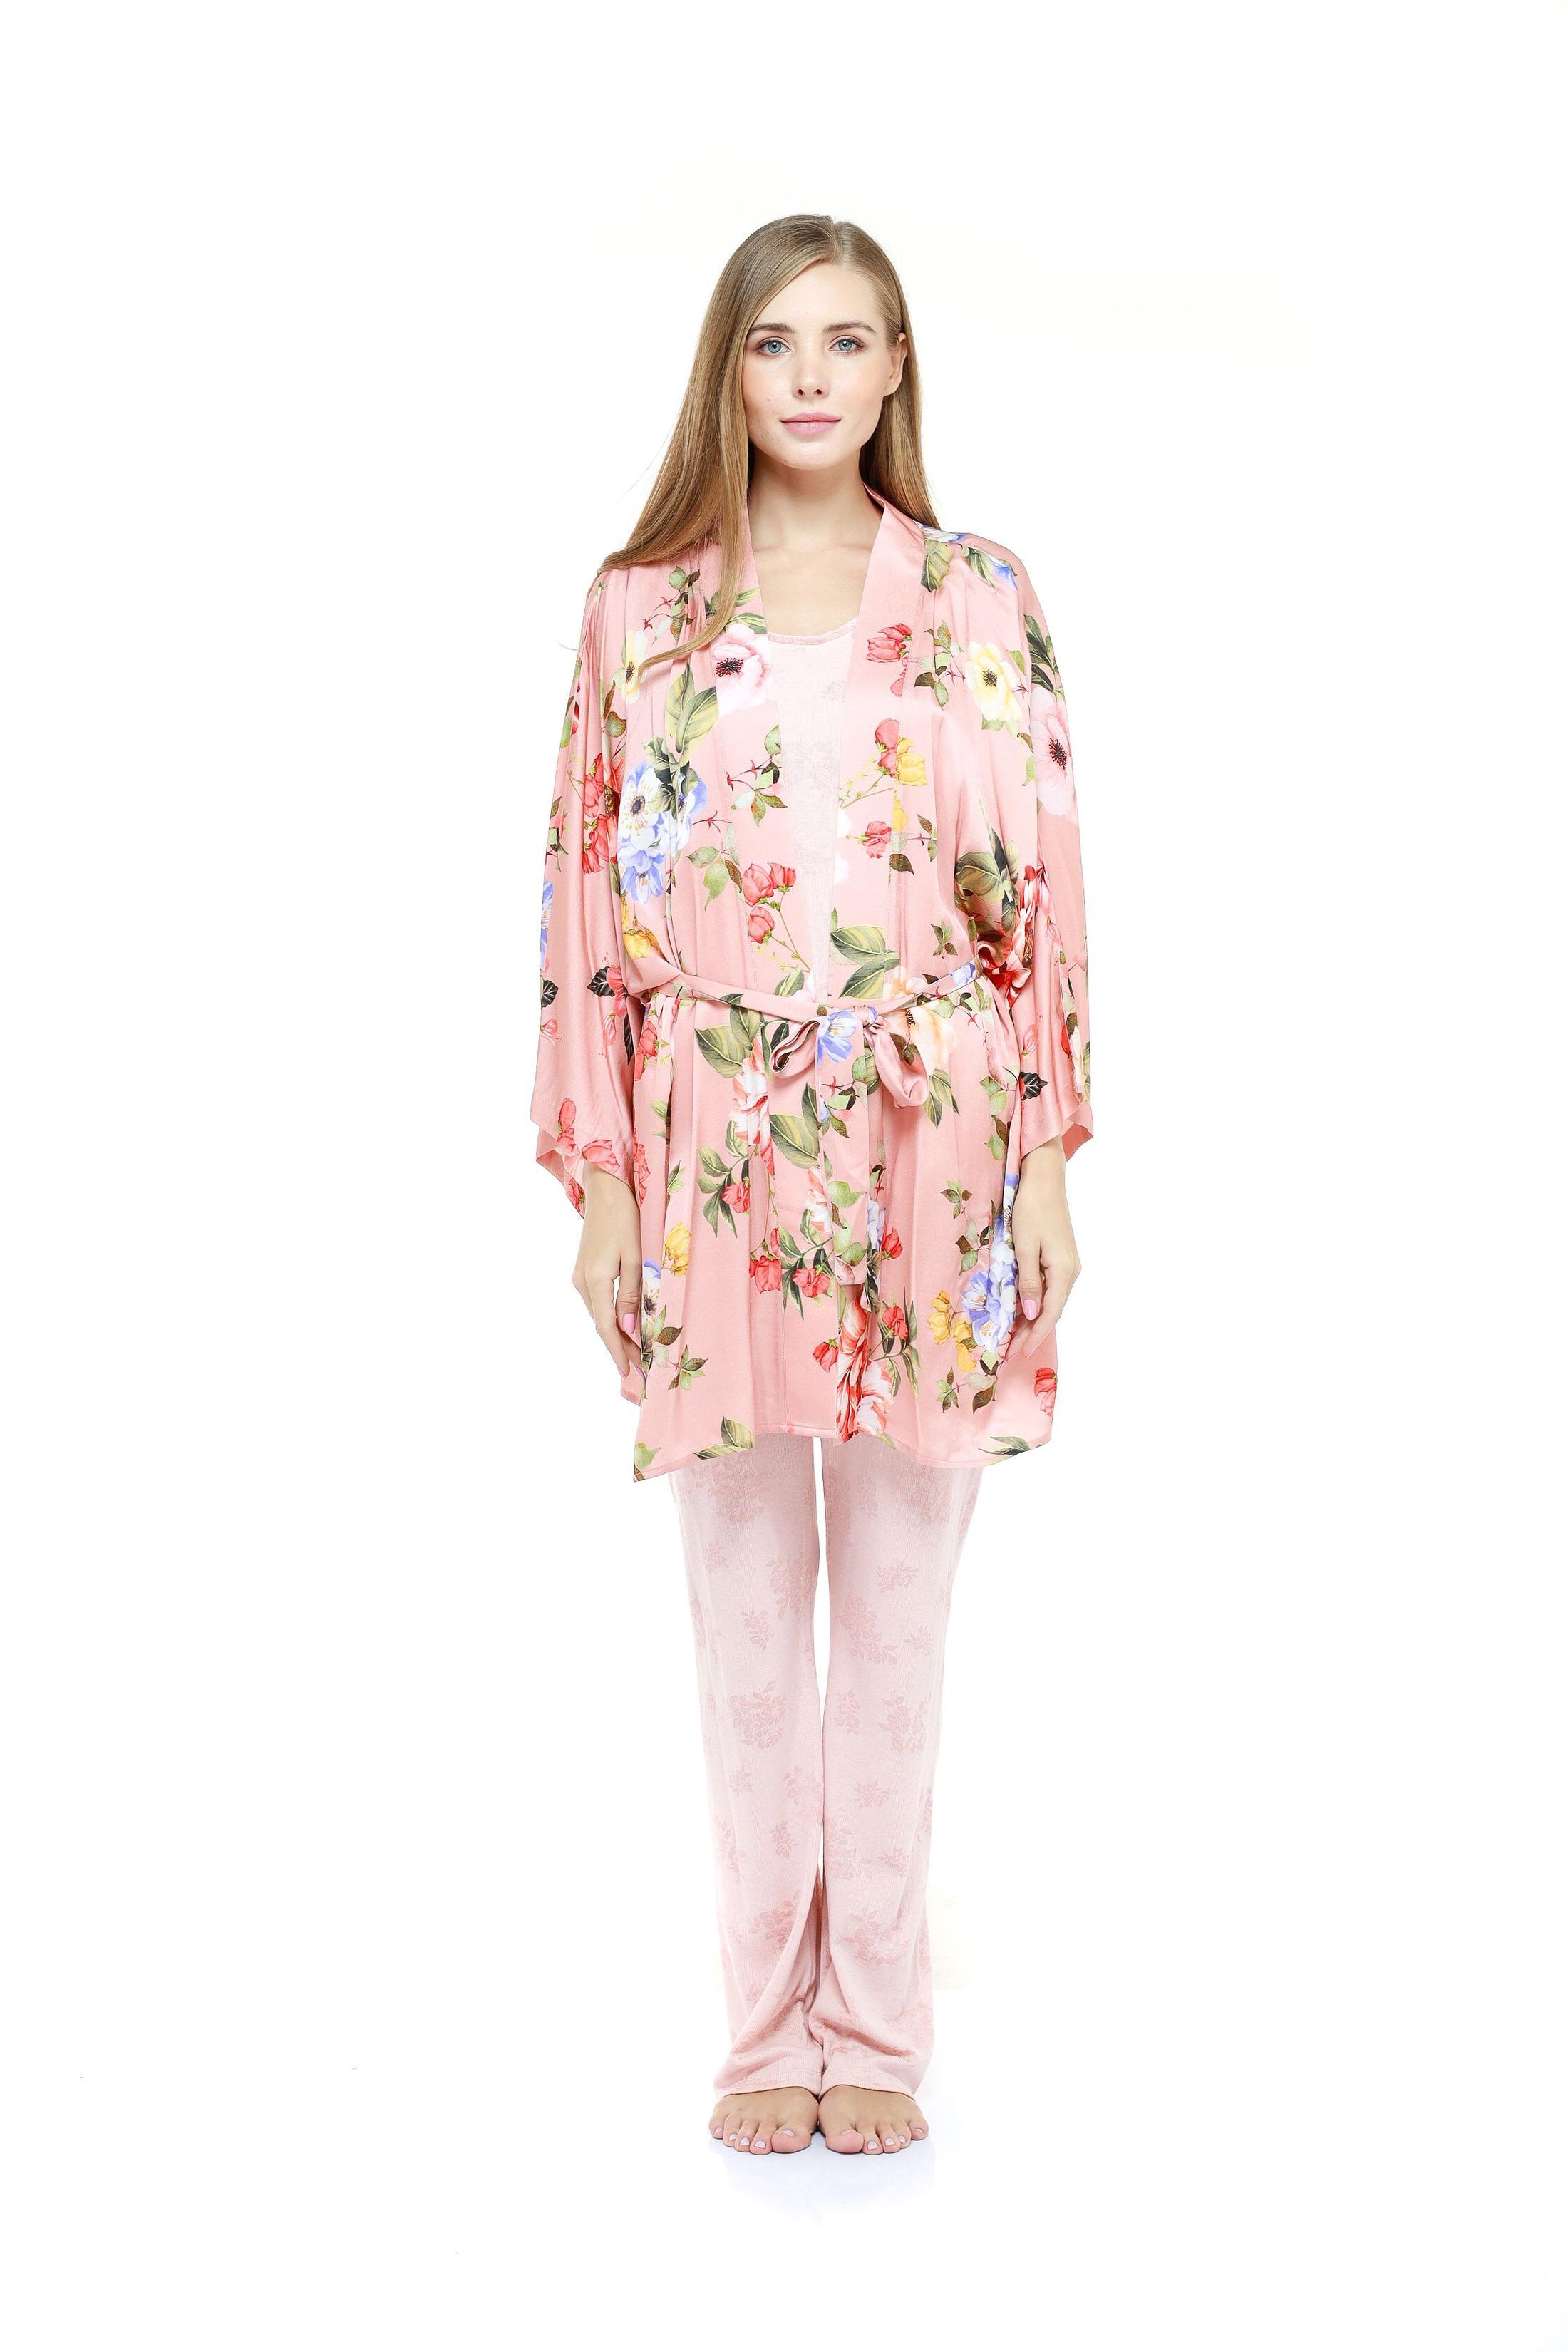 Floral Pyjama Set - Peach